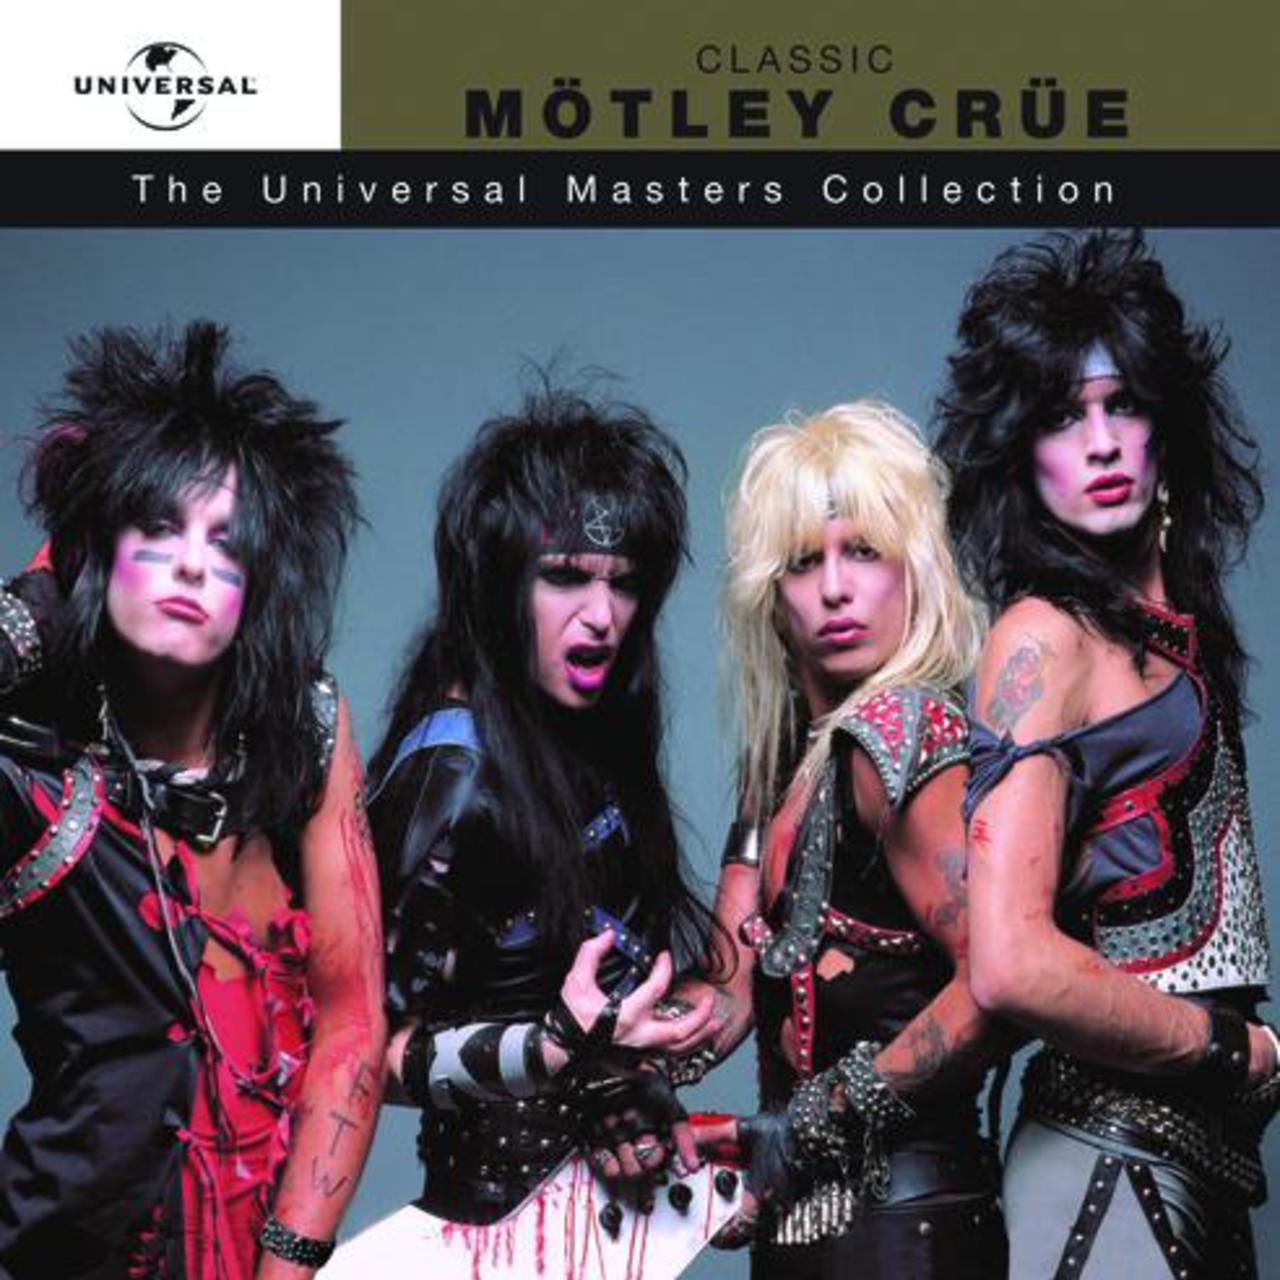 TIDAL: Listen to Mötley Crüe on TIDAL